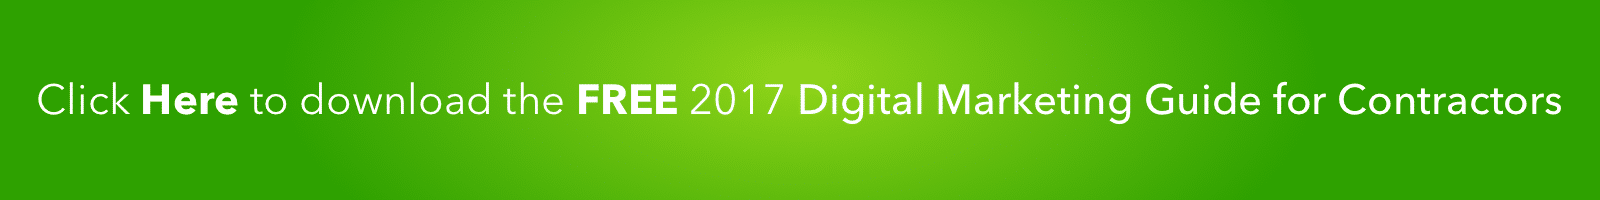 2017 digital marketing guide for contractors